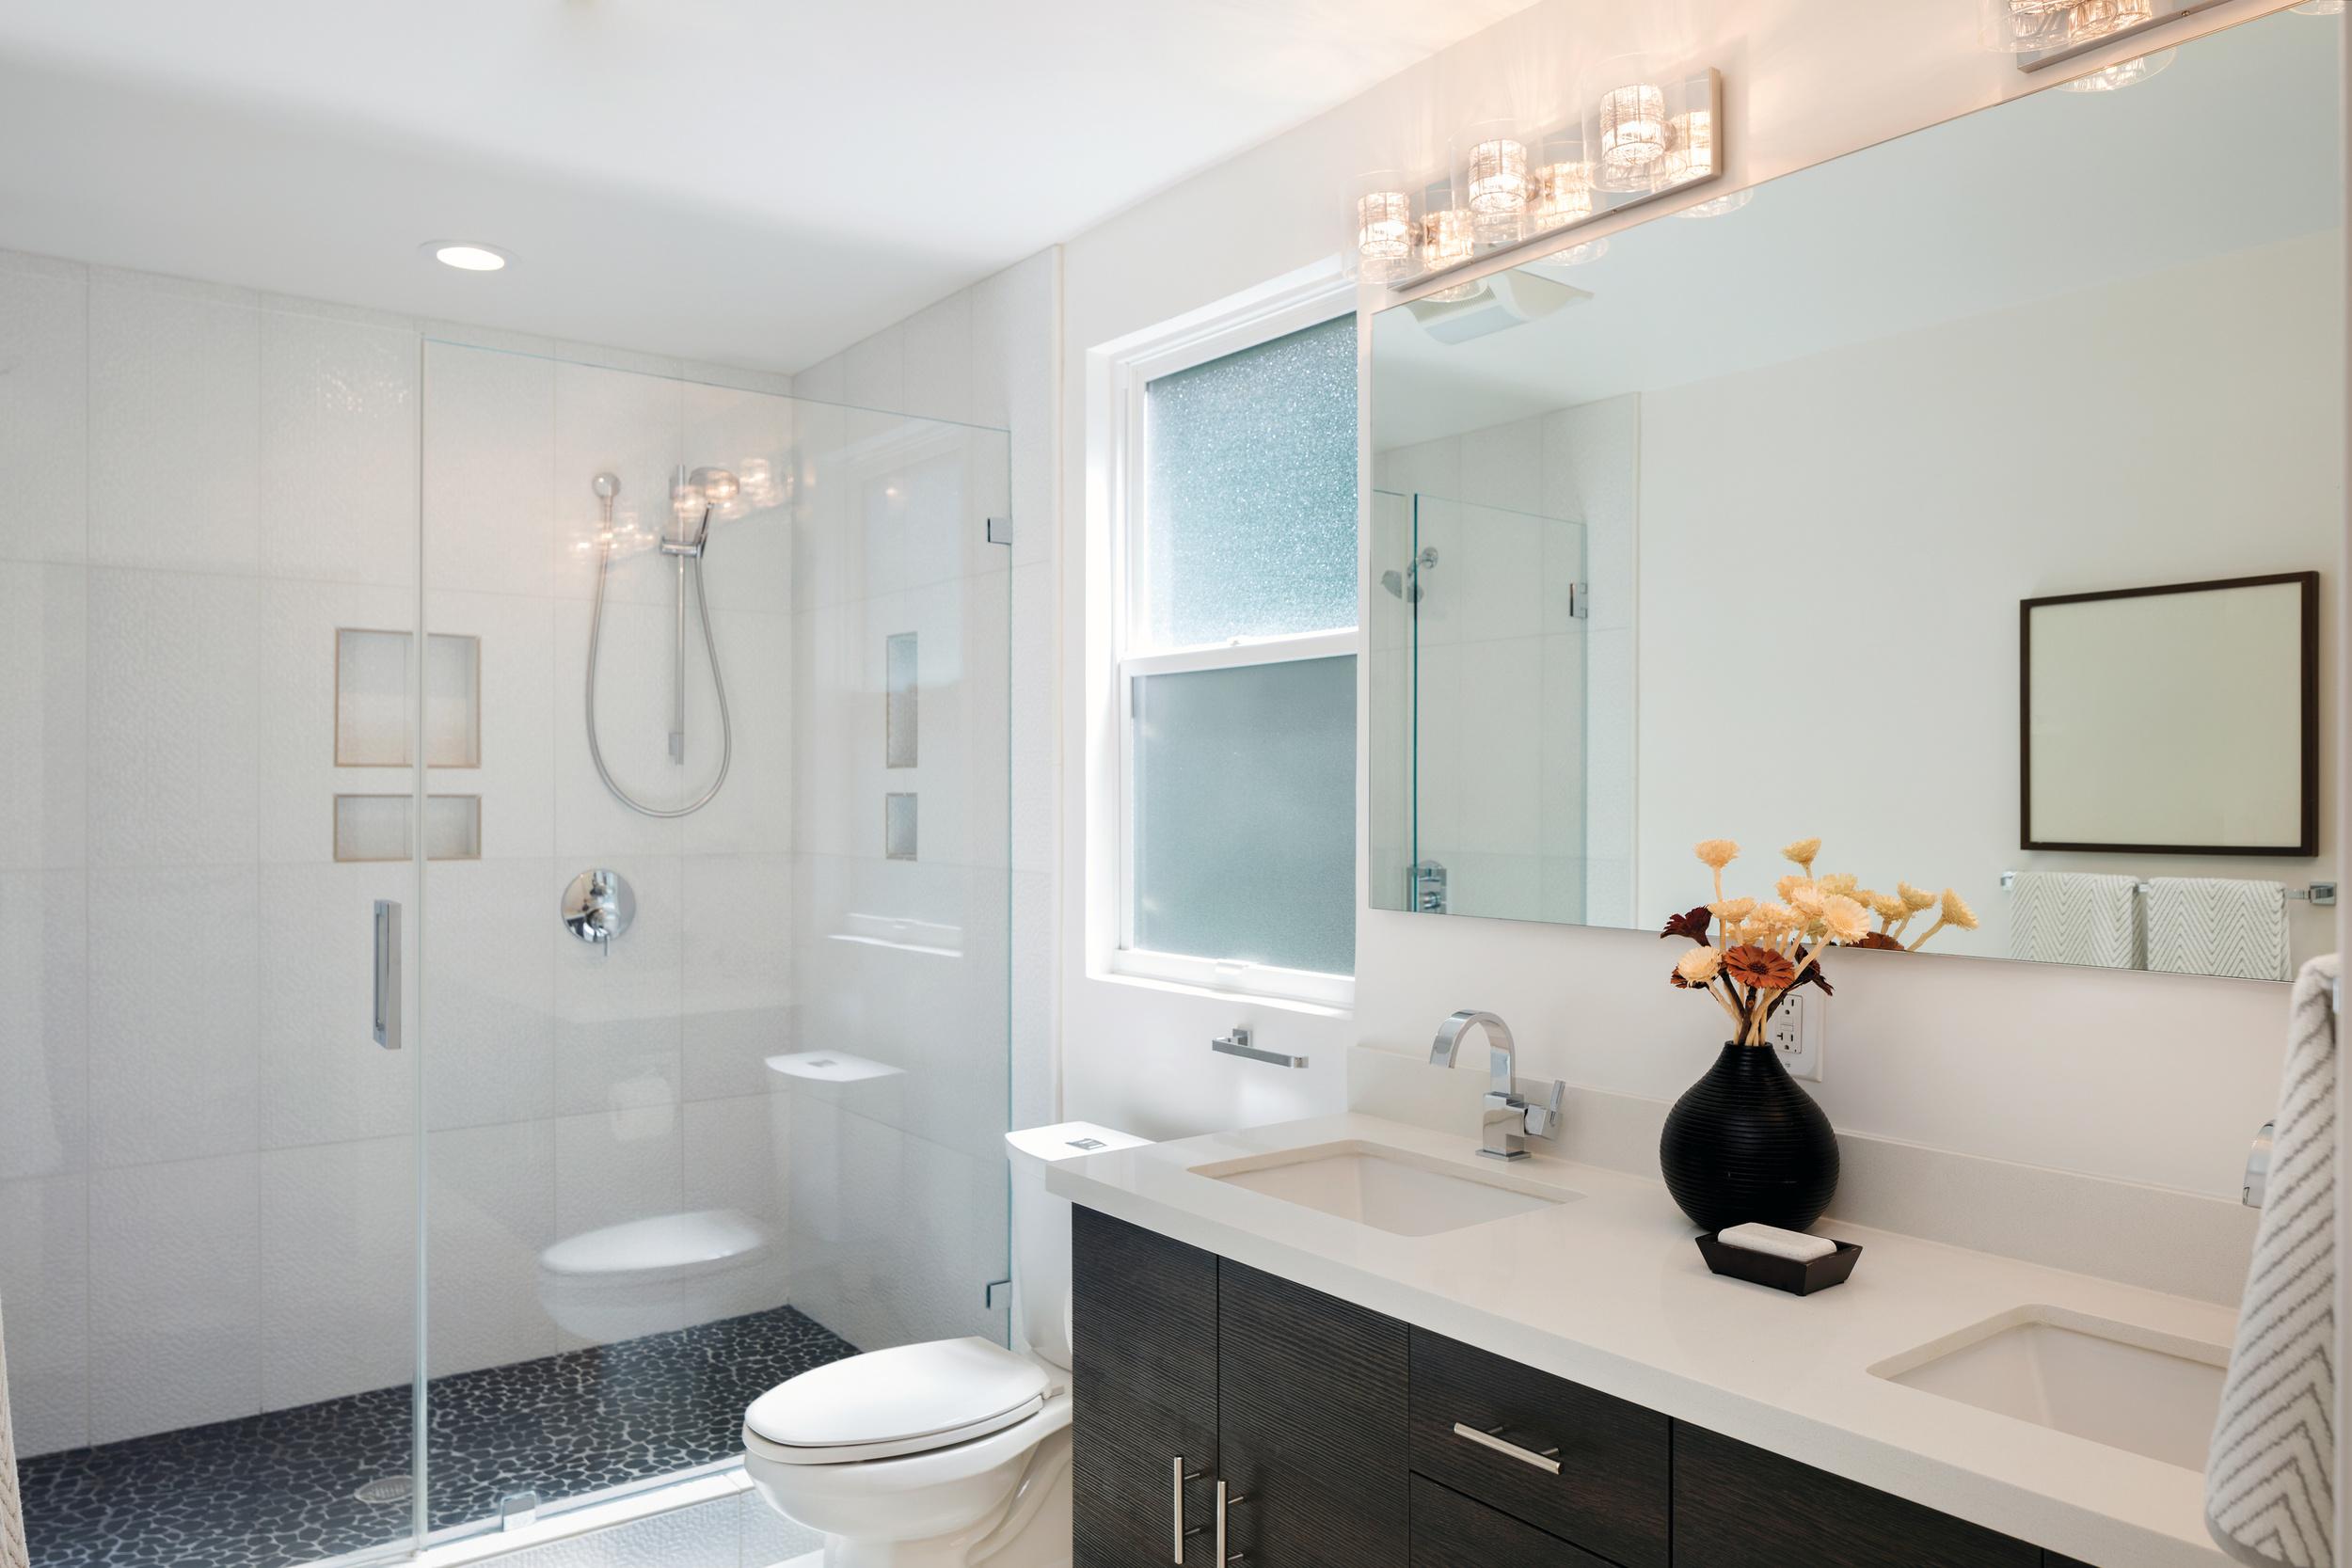 bathroom-refinishing-schaumburg-bathroom-remodeling-companies-schaumburg